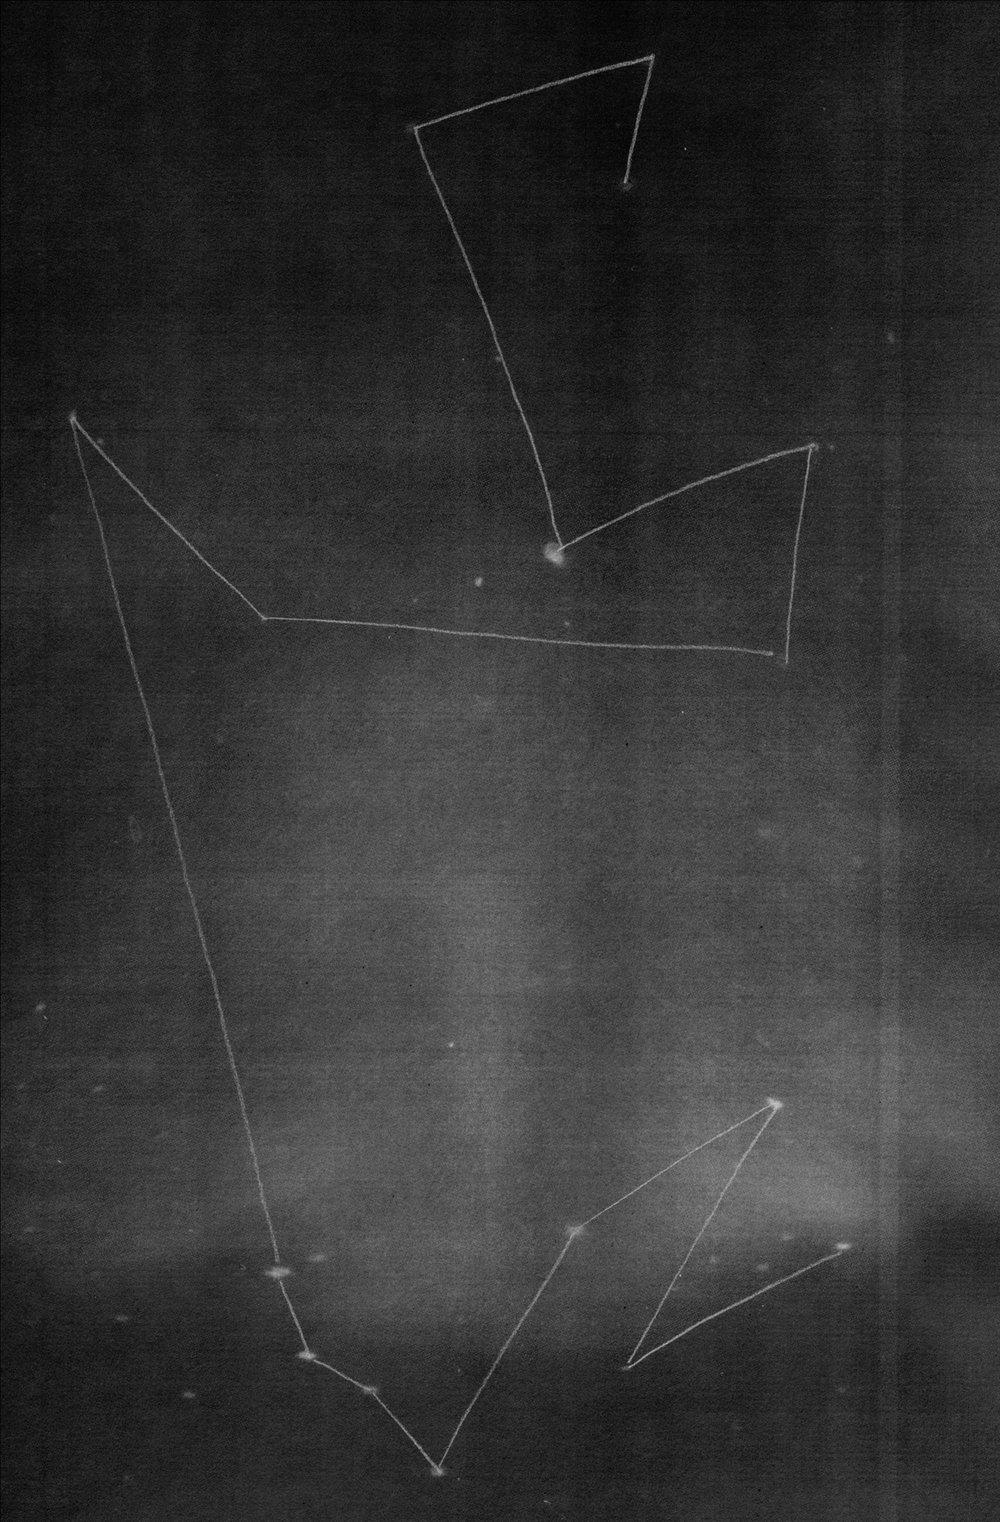 Constellations_AriadnaJunyent1.jpg